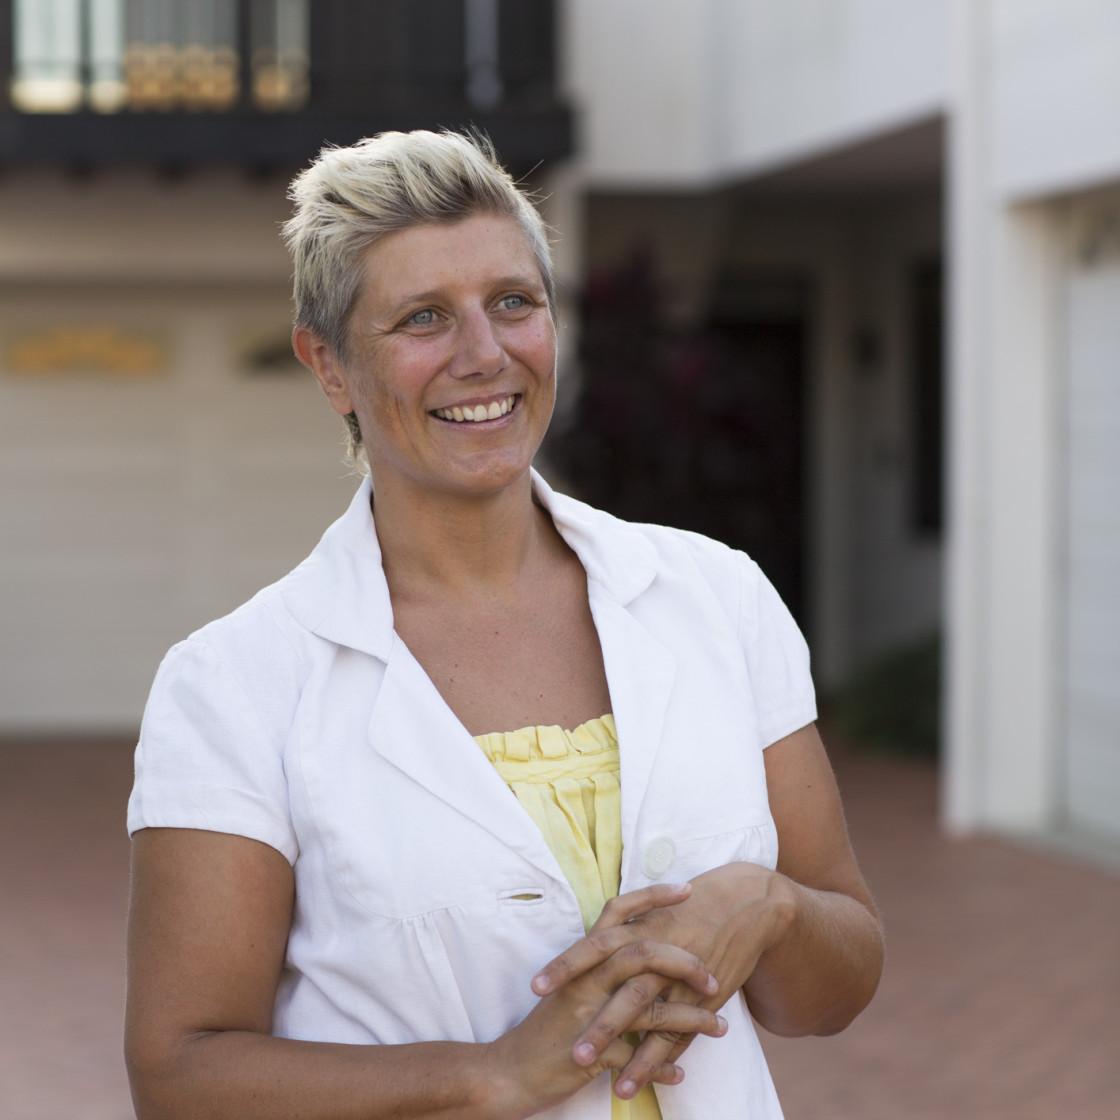 Melanie Thorley Brisbane based employee and employer lawyer